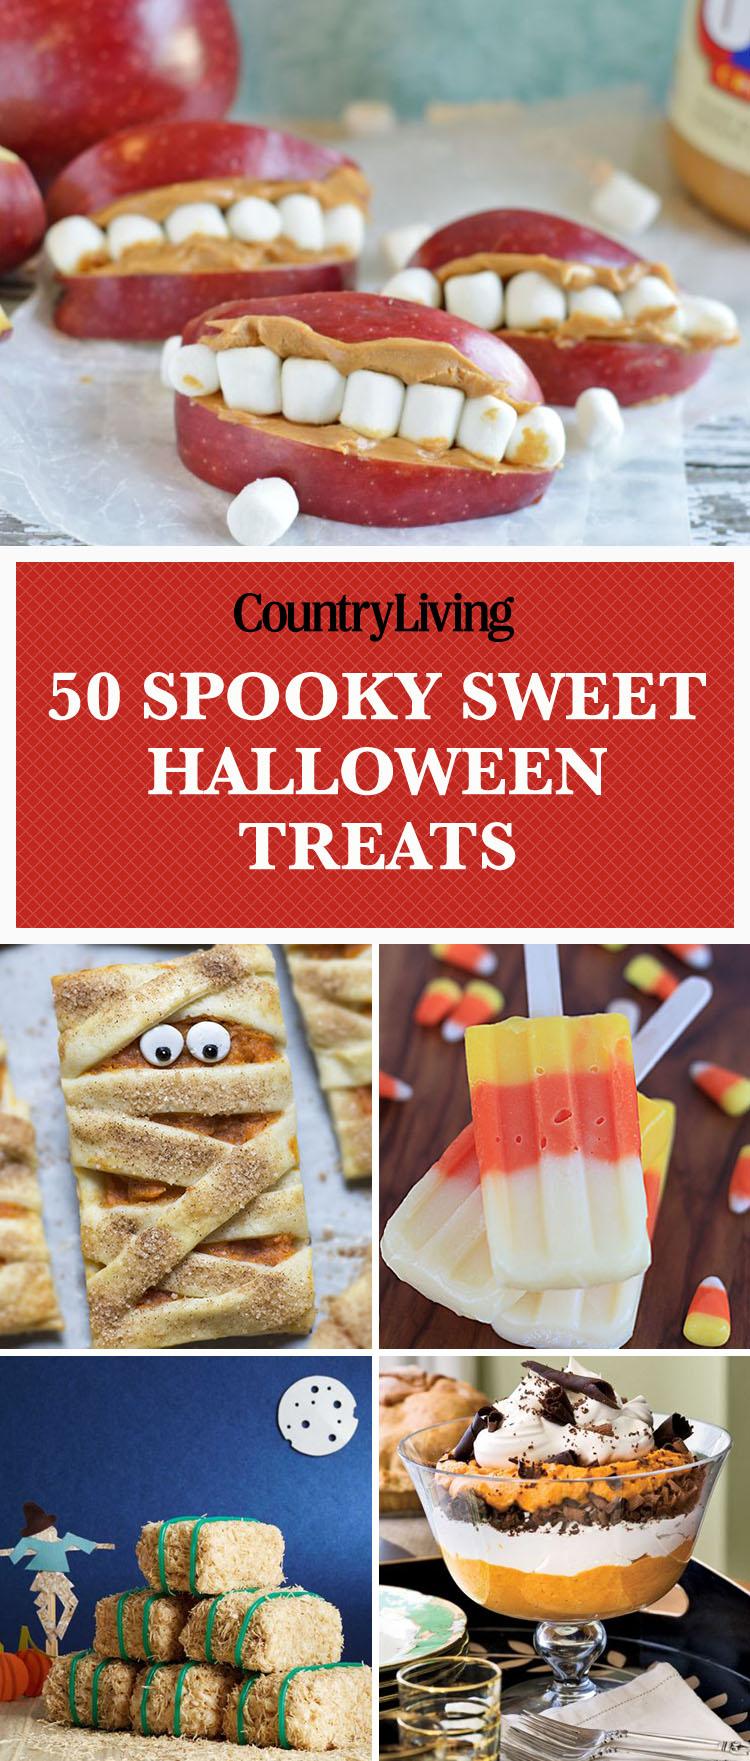 50 homemade halloween treats easy halloween dessert recipes - Spooky Food For Halloween